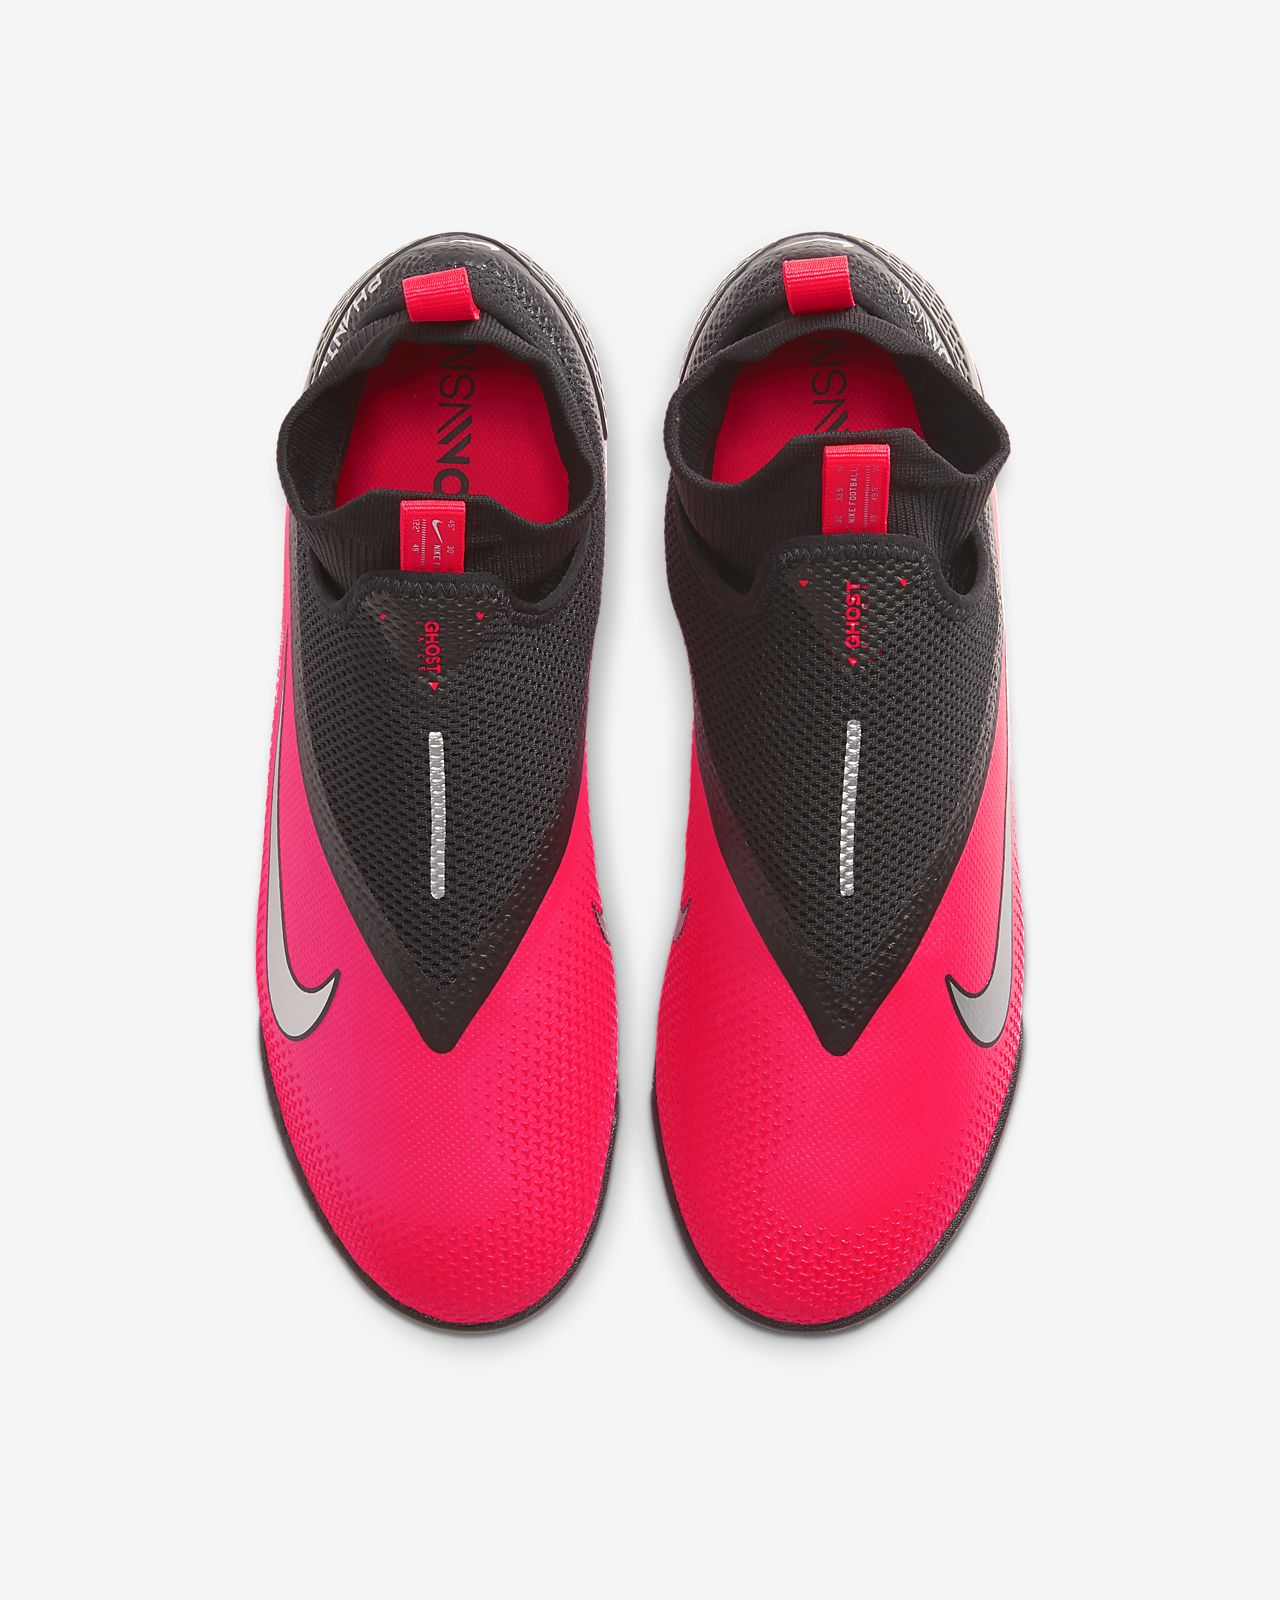 Scarpa da calcio per erba artificialesintetica Nike React Phantom Vision 2 Pro Dynamic Fit TF